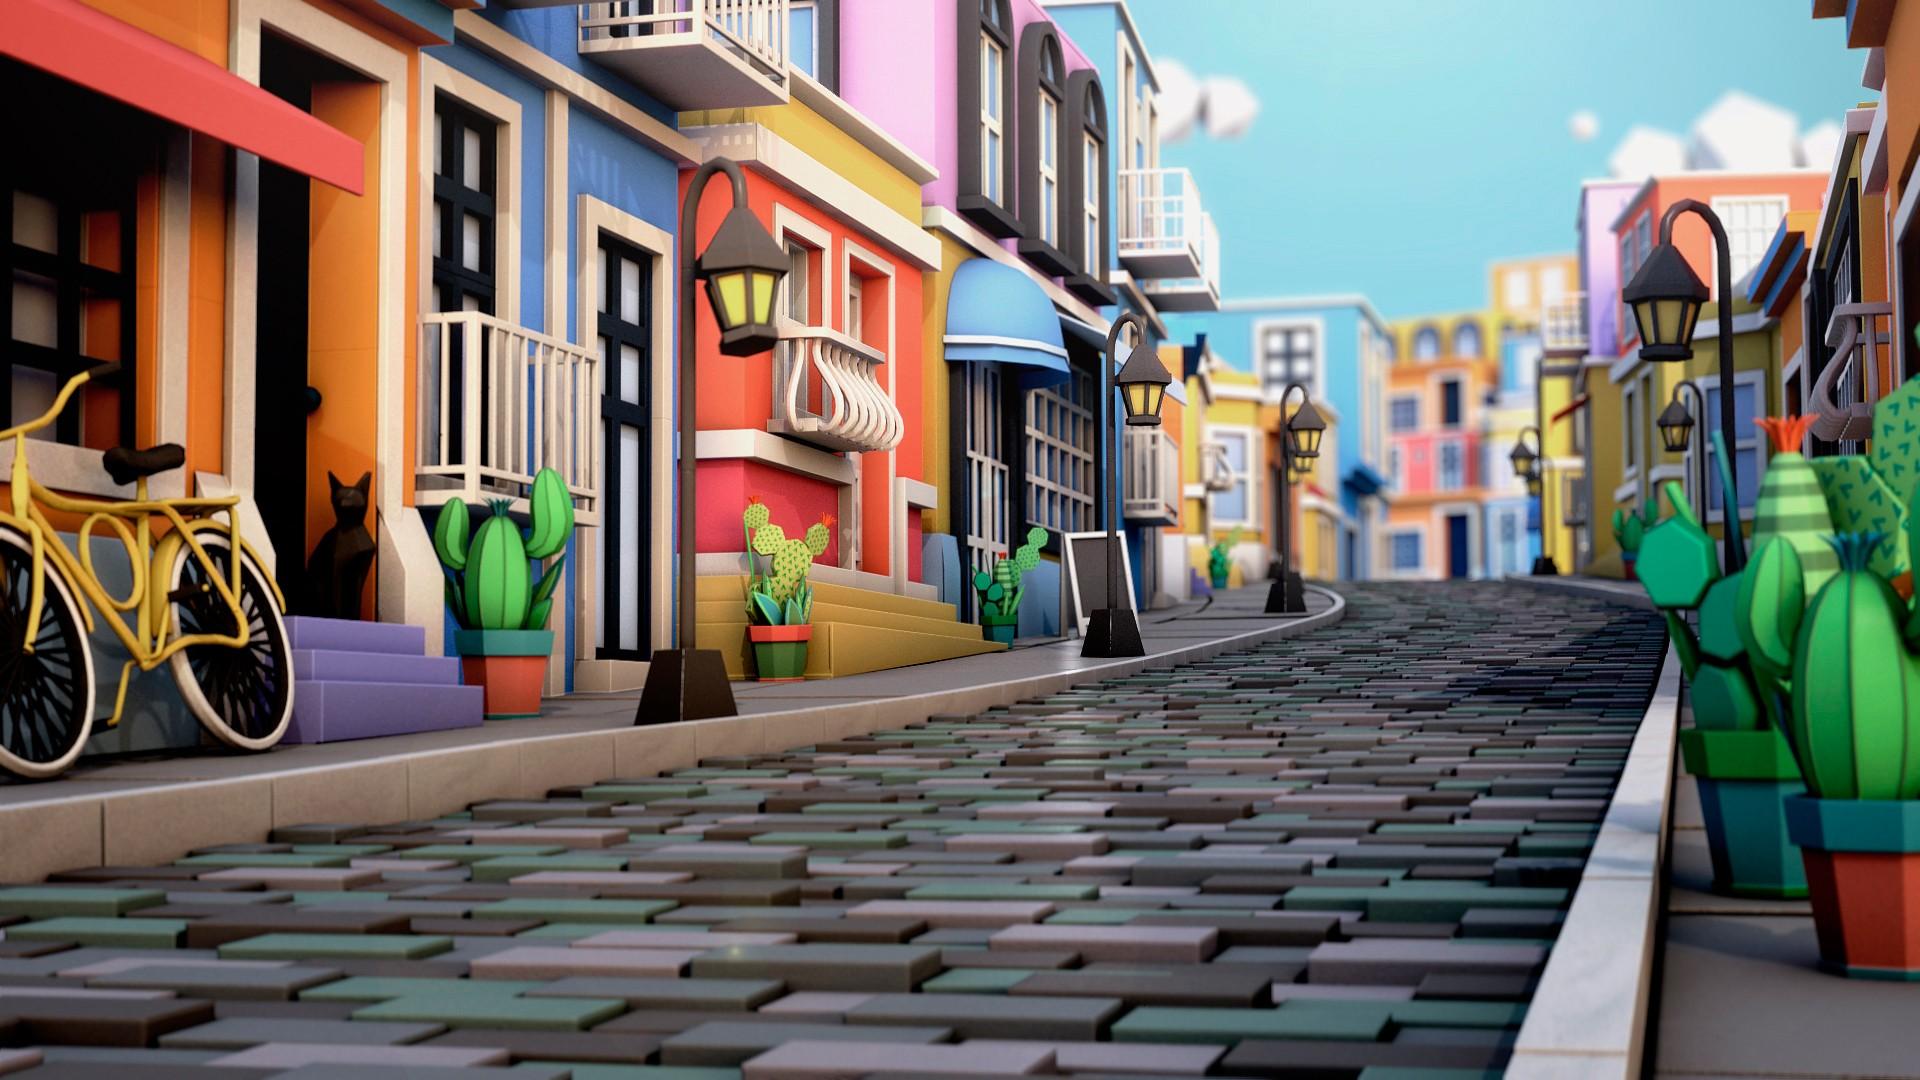 Картинки веселого города